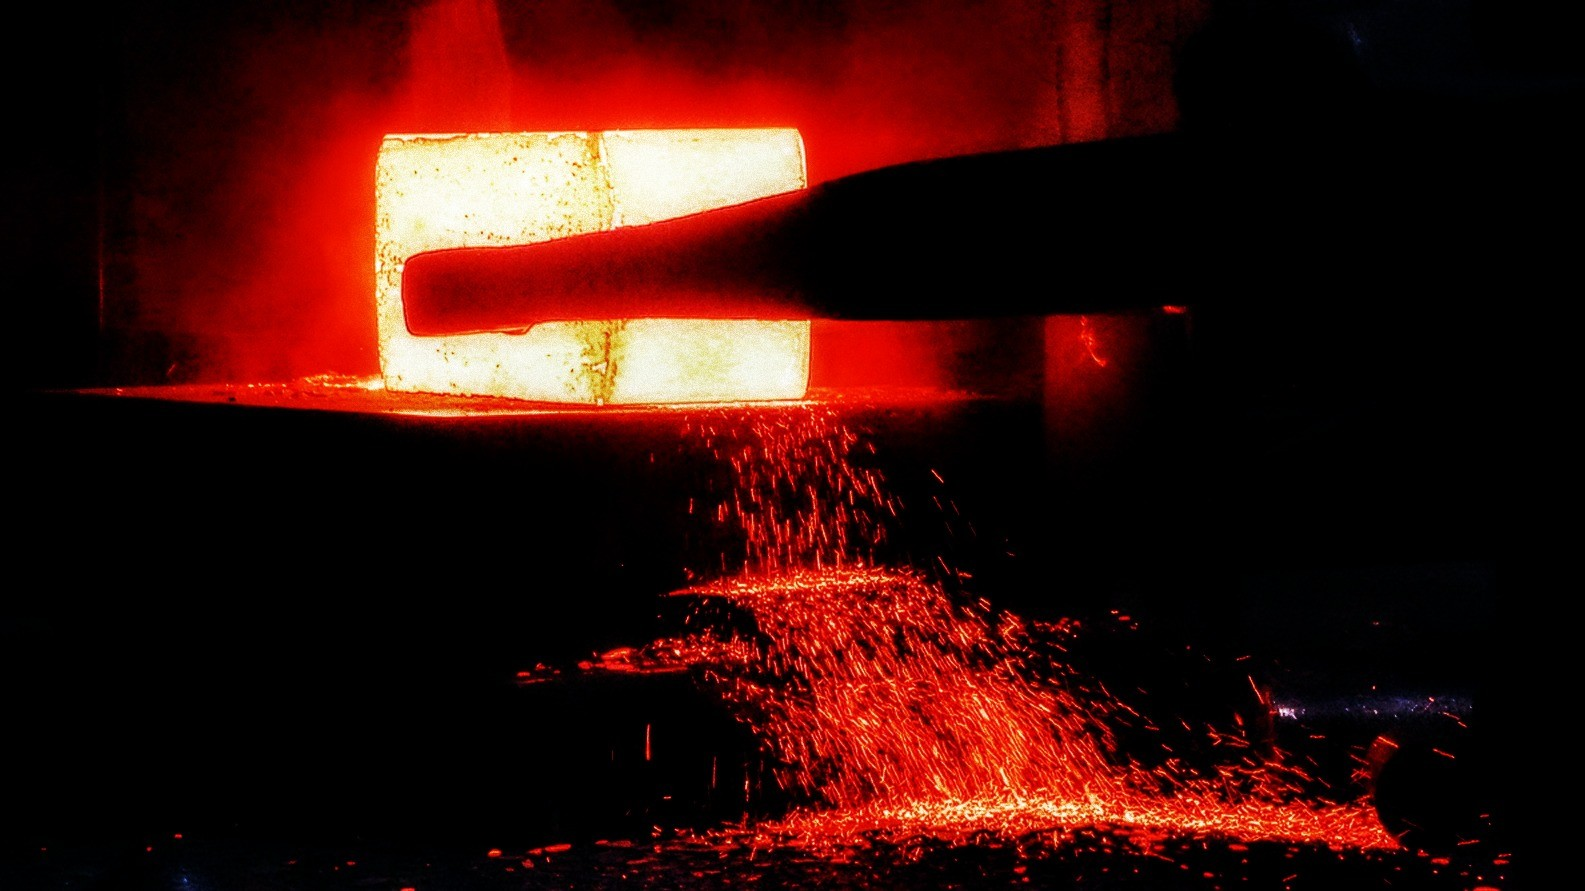 Forging iron / Flickr / Rosebud 23 / EPNA, Brussels / CC BY-NC-ND